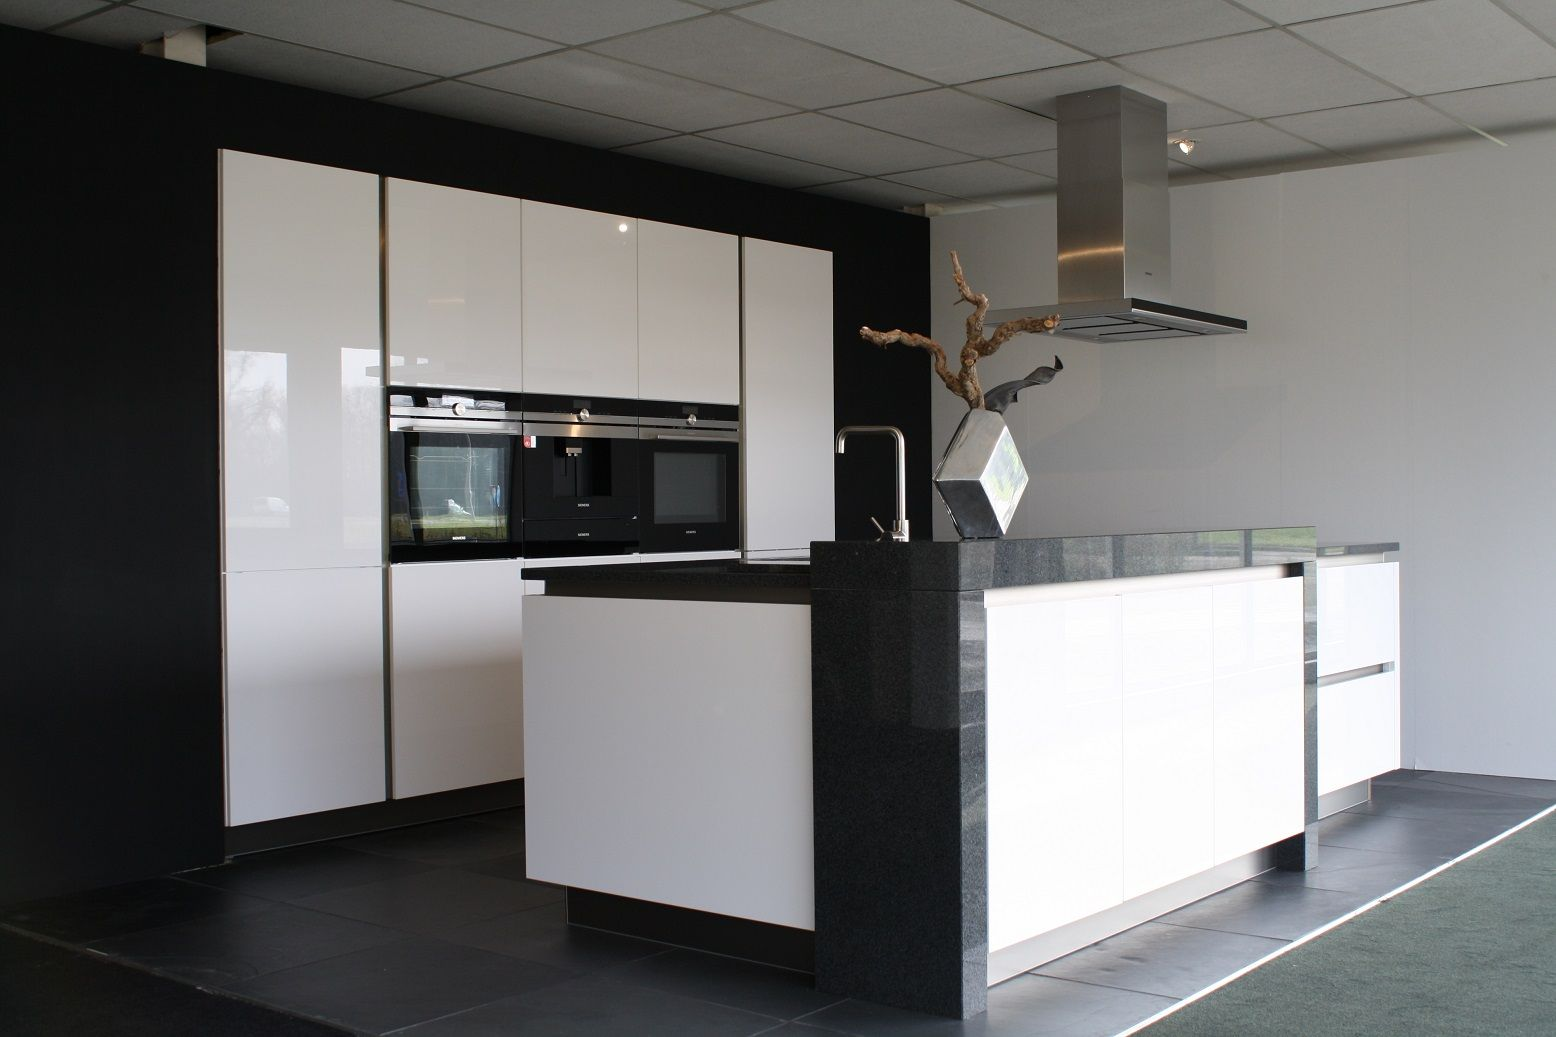 Koffiemachine De Keuken : Keuken lucida bkb keukens